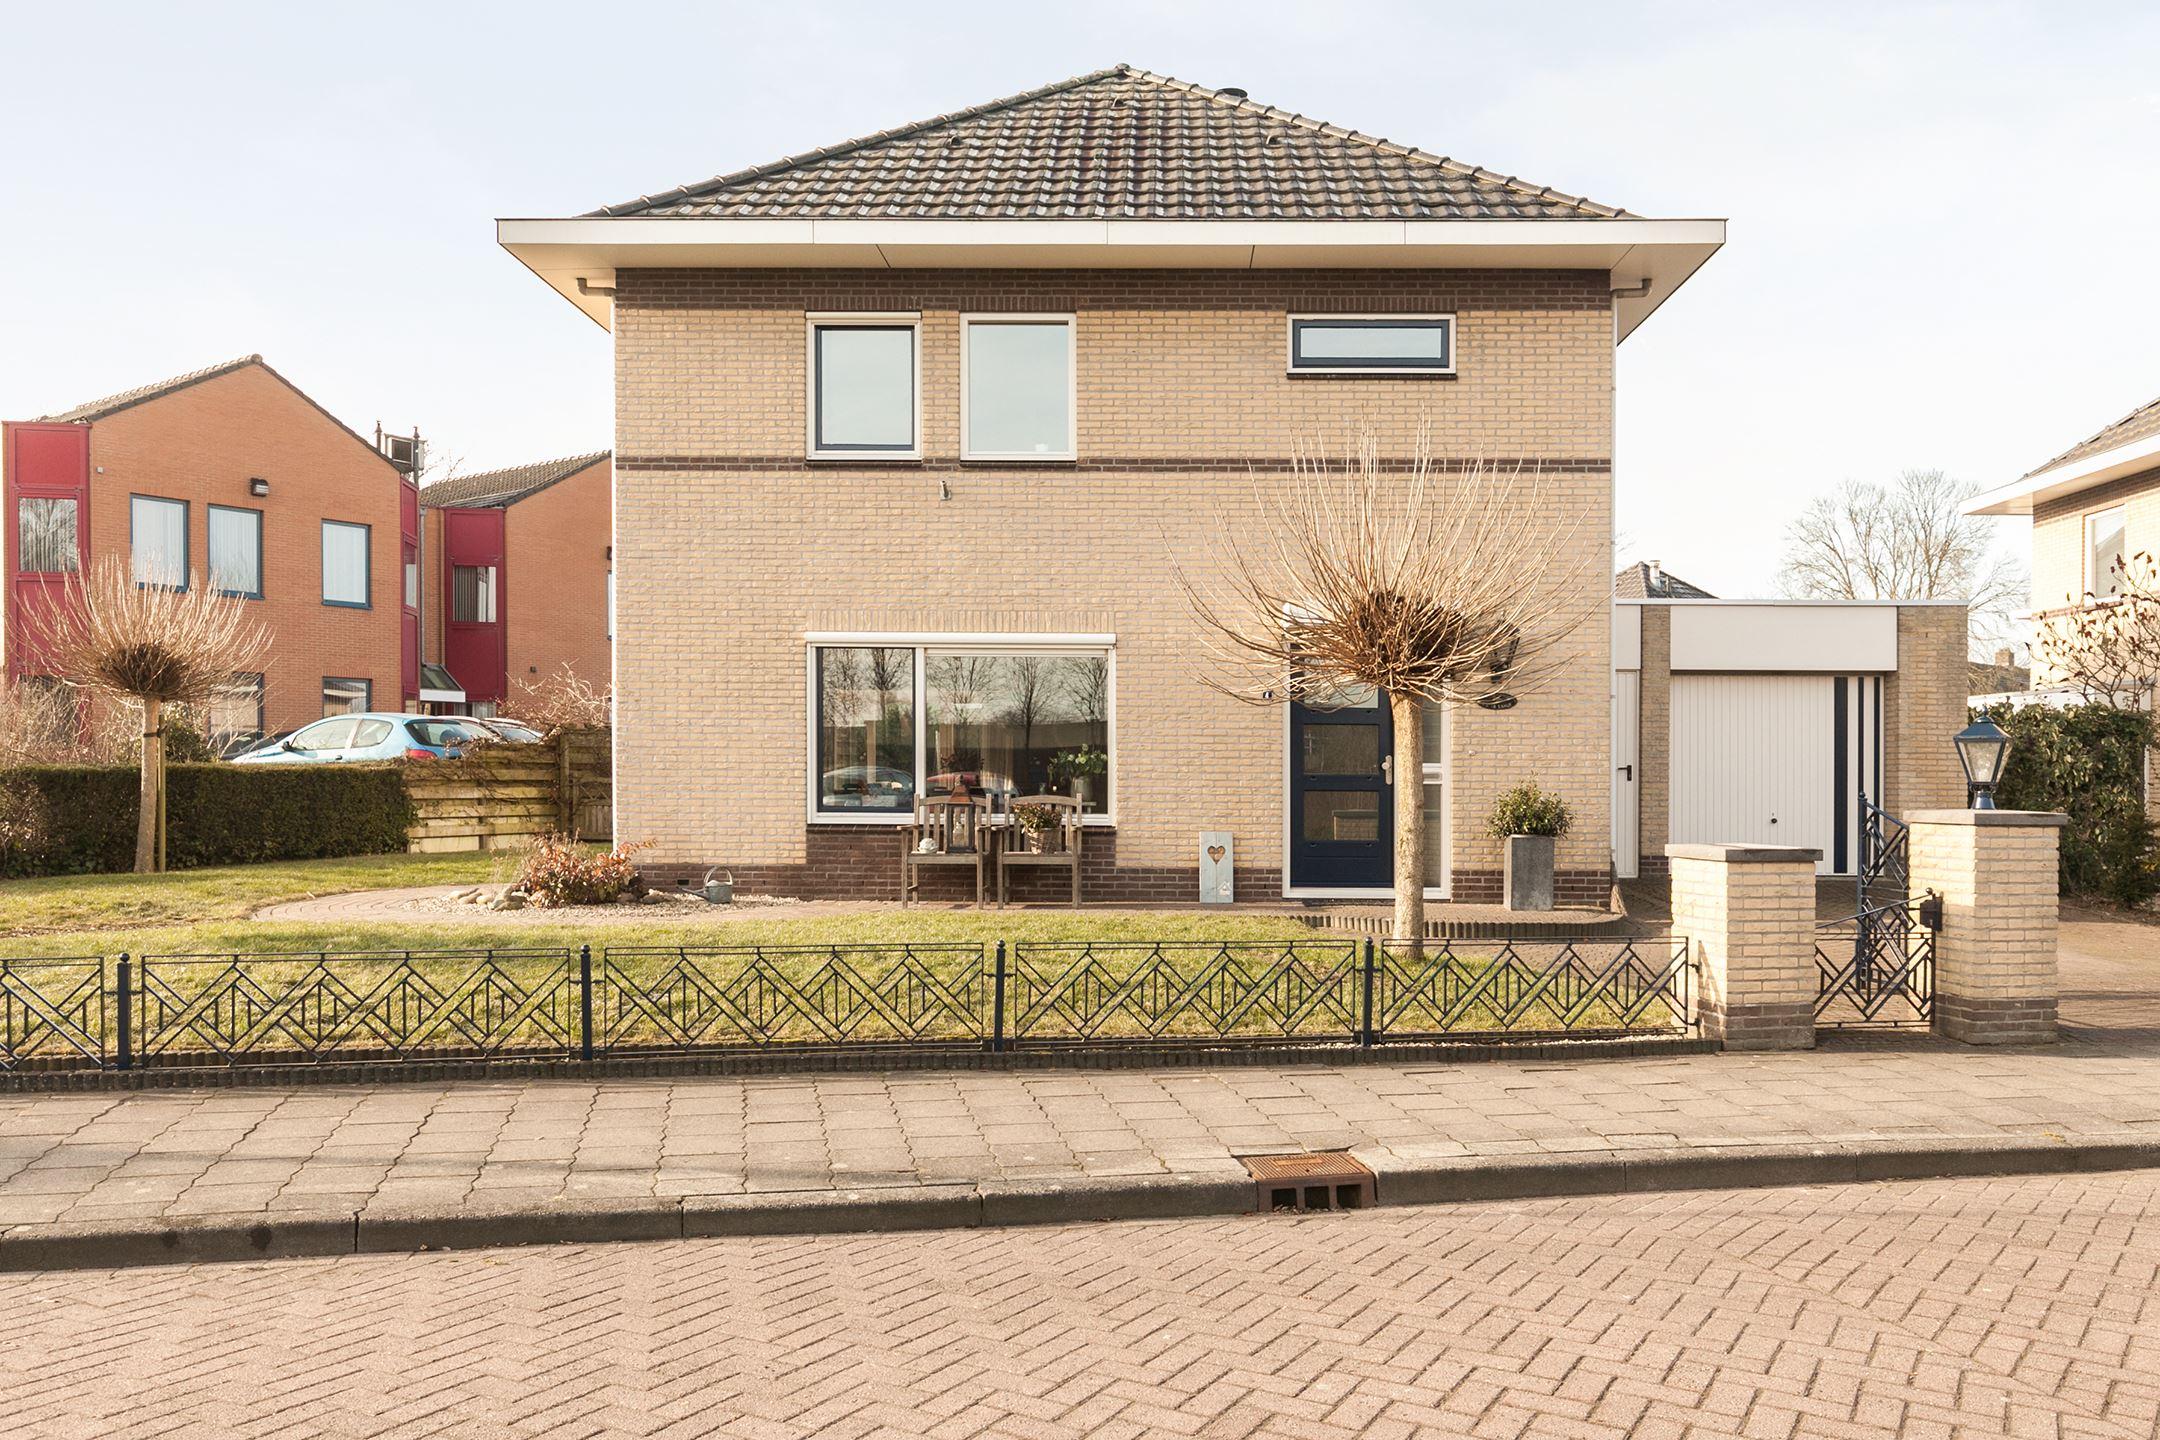 Huis te koop altenaweg 4 8081 tv elburg funda for Garage oostendorp